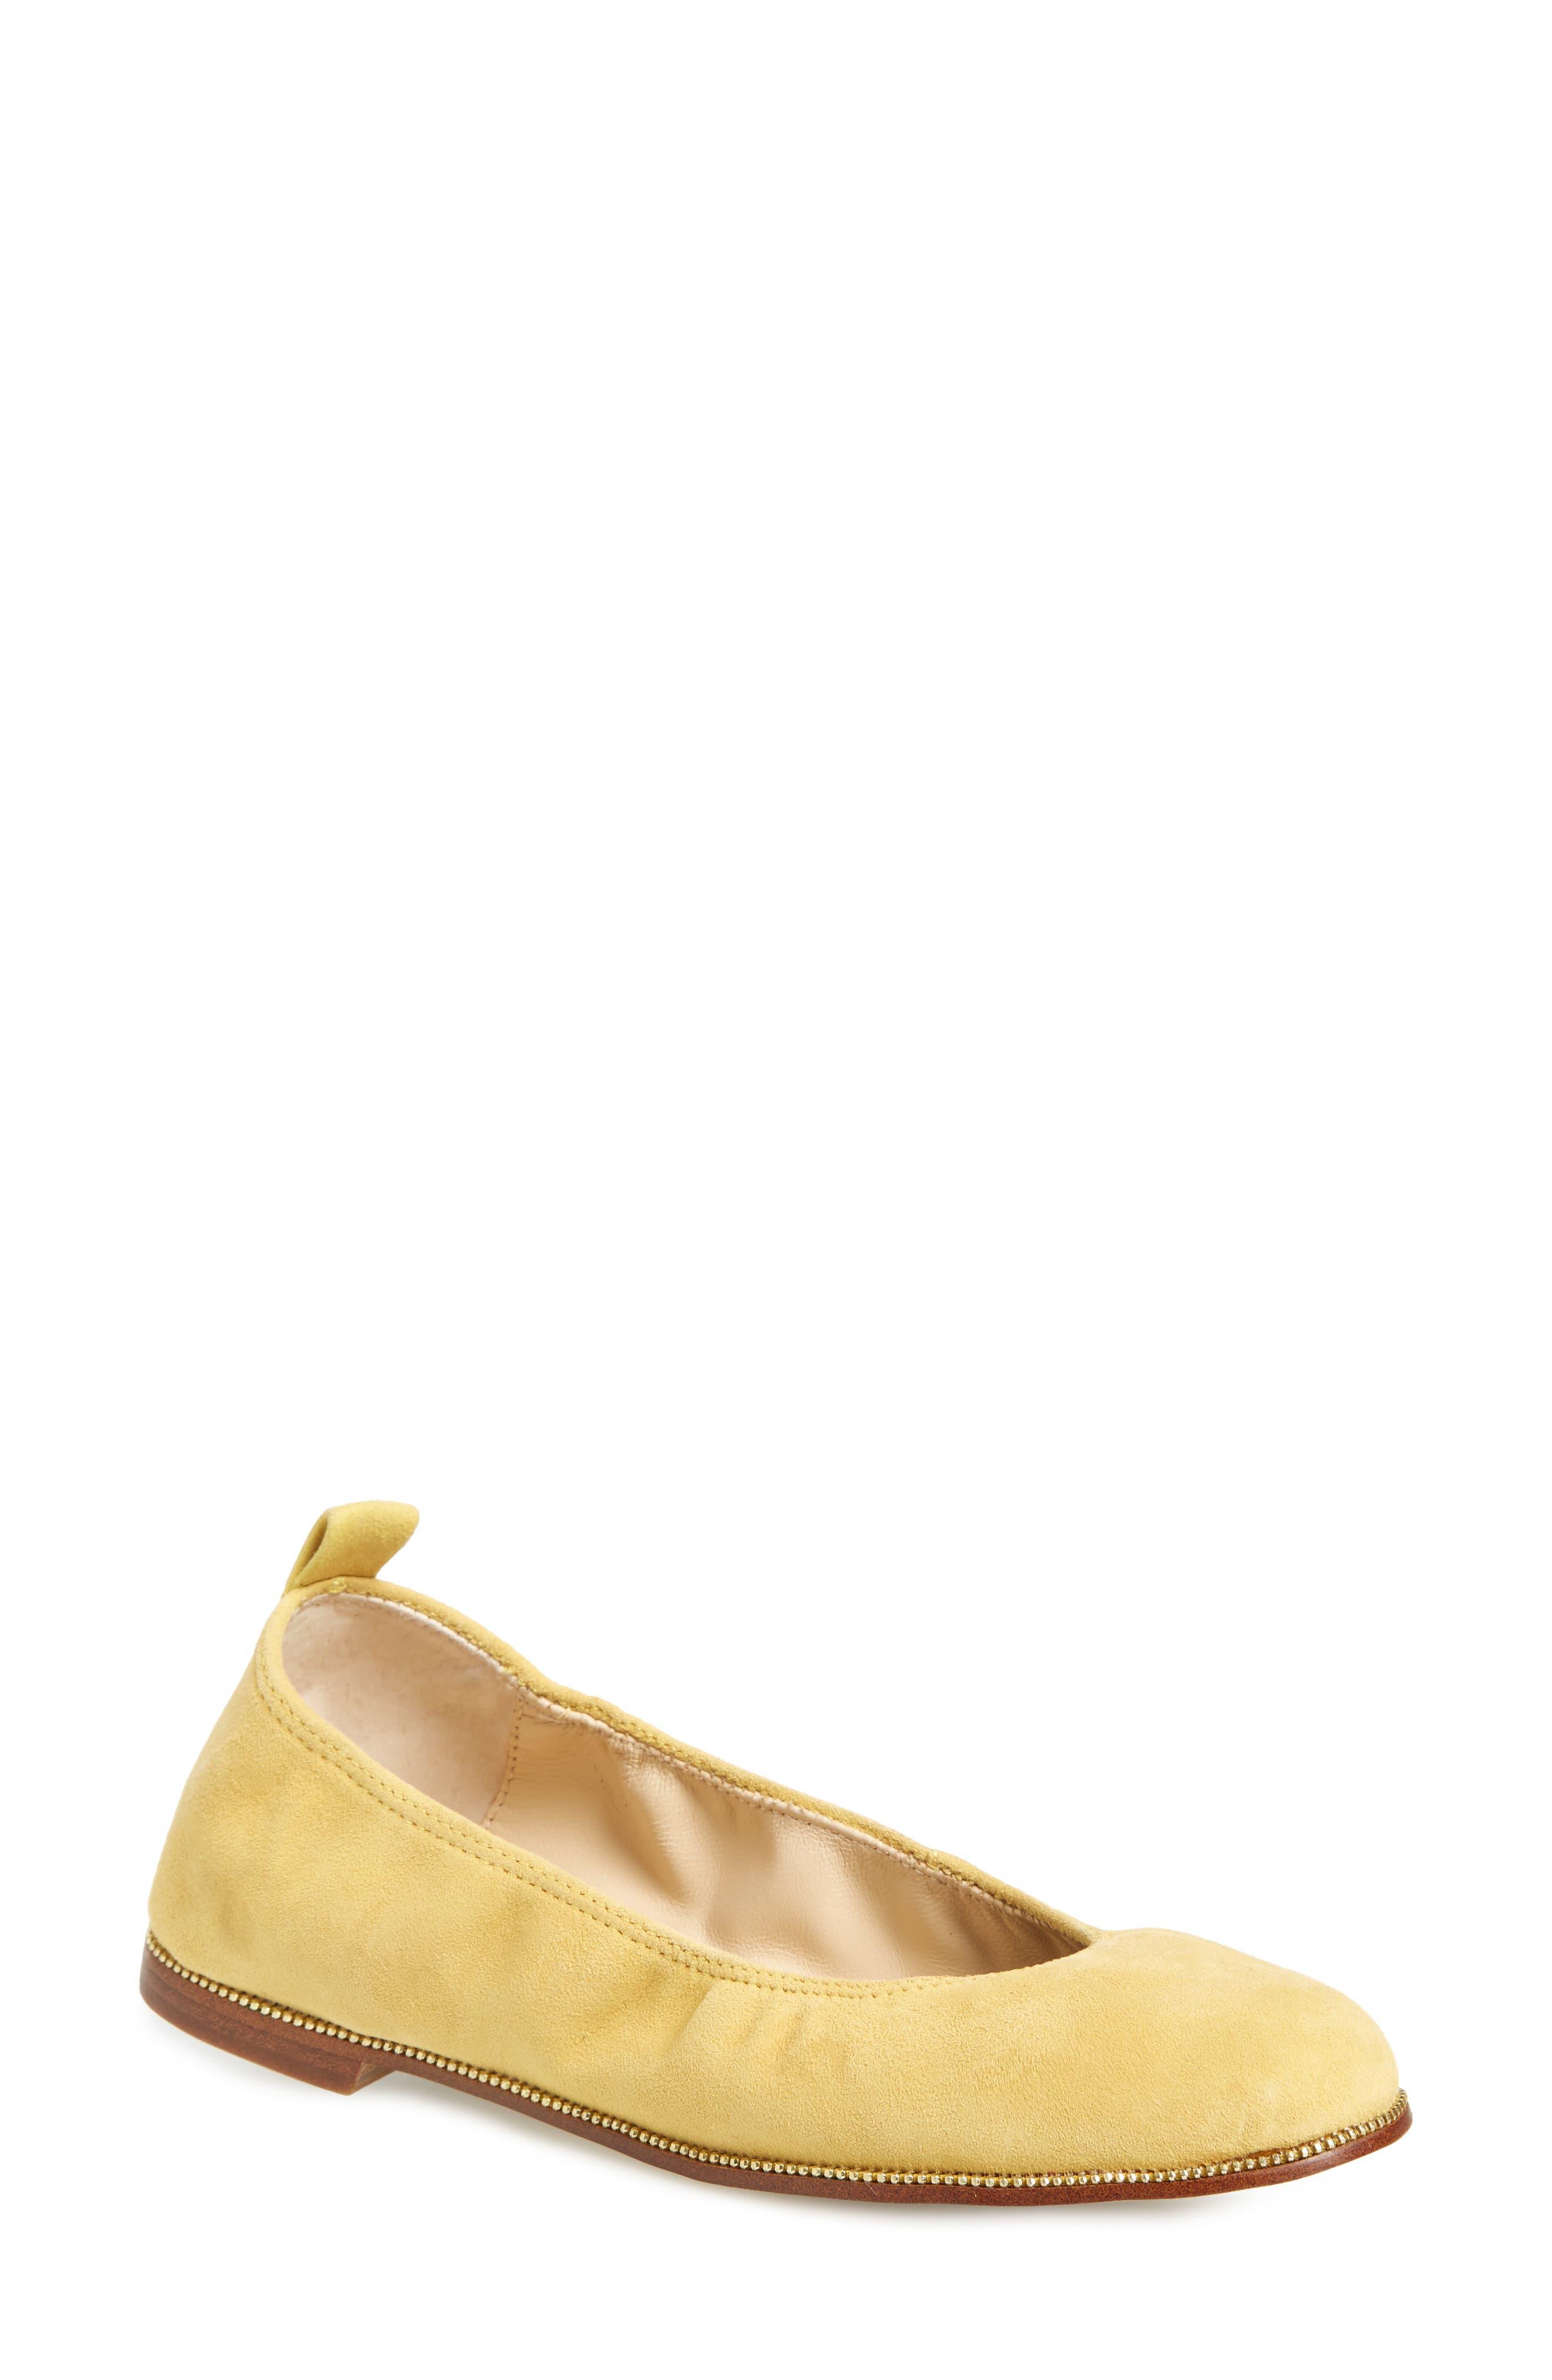 Mason Ballet Flat,                             Main thumbnail 1, color,                             Pineapple Suede